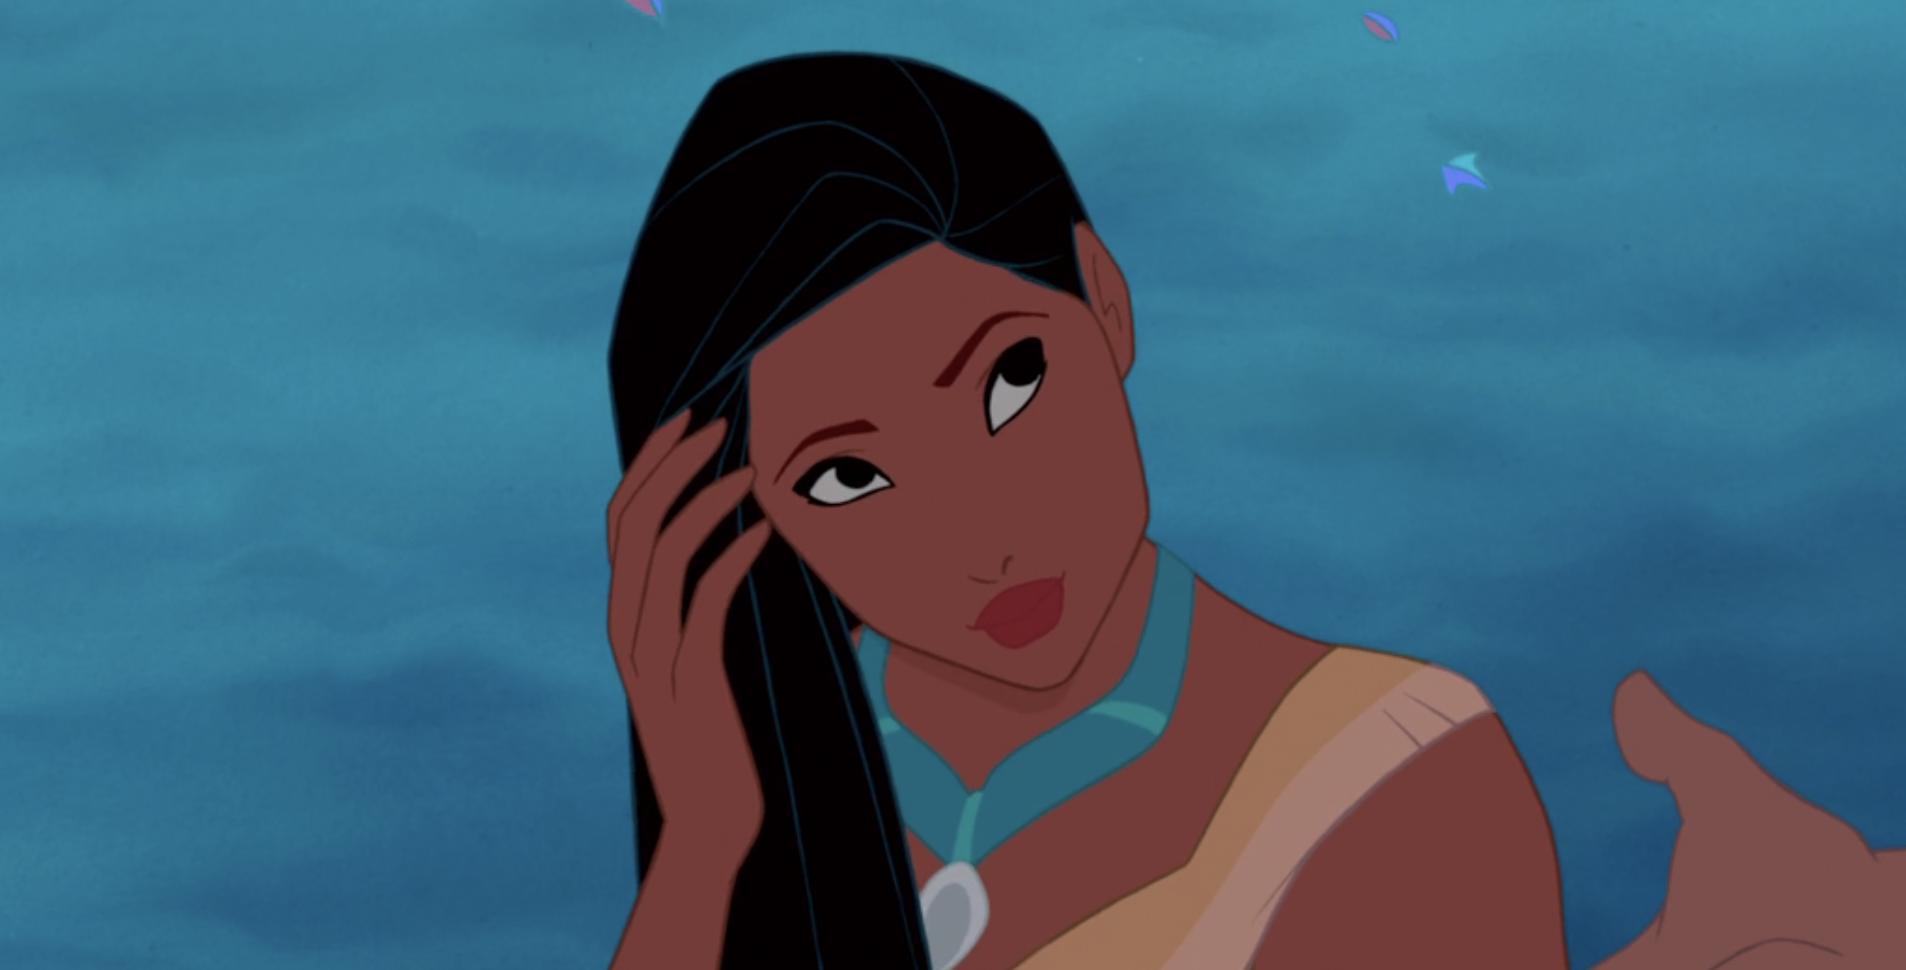 Pocahontas tucks some hair behind her ear